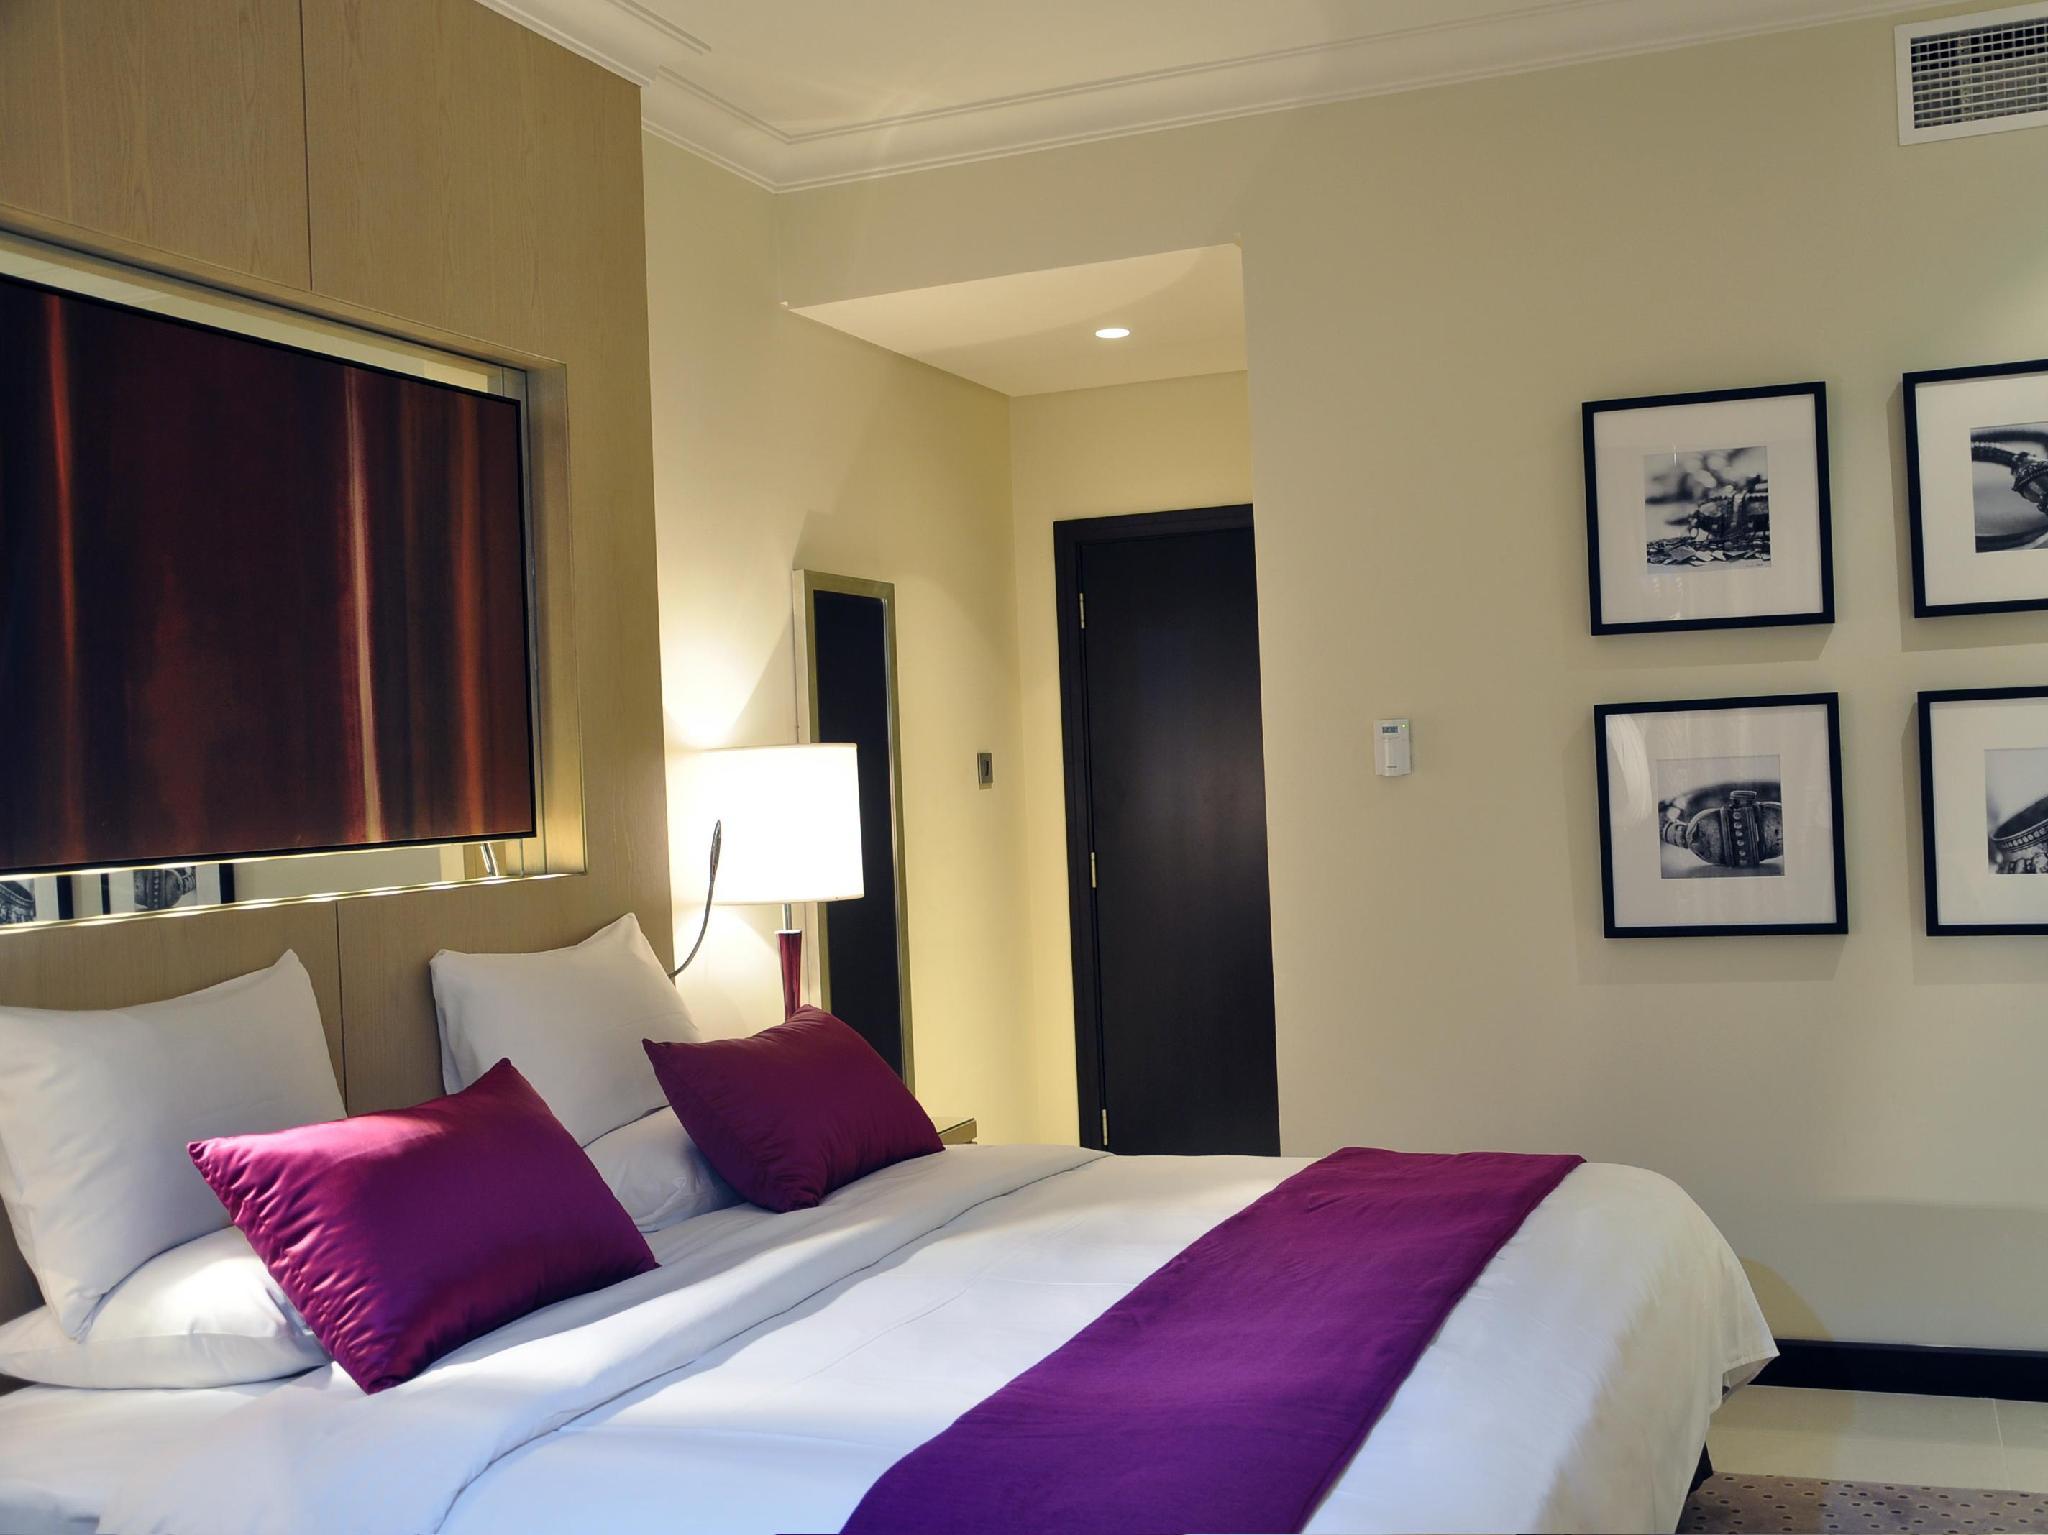 Gulf hotel bahrain, manama   boek een aanbieding op agoda.com